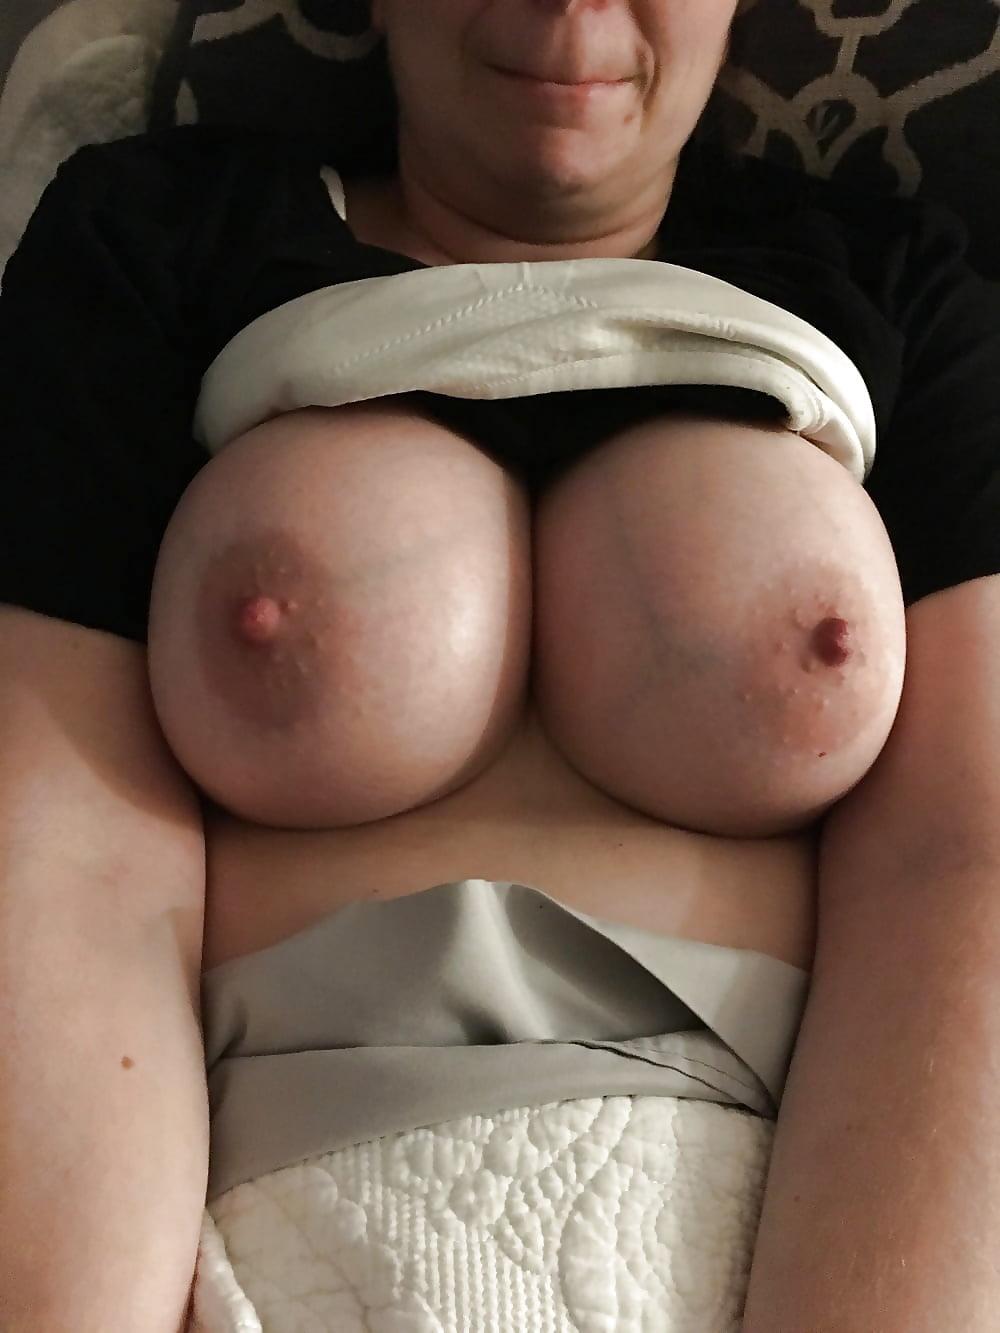 Boobs wife boobs video wife tube amateur